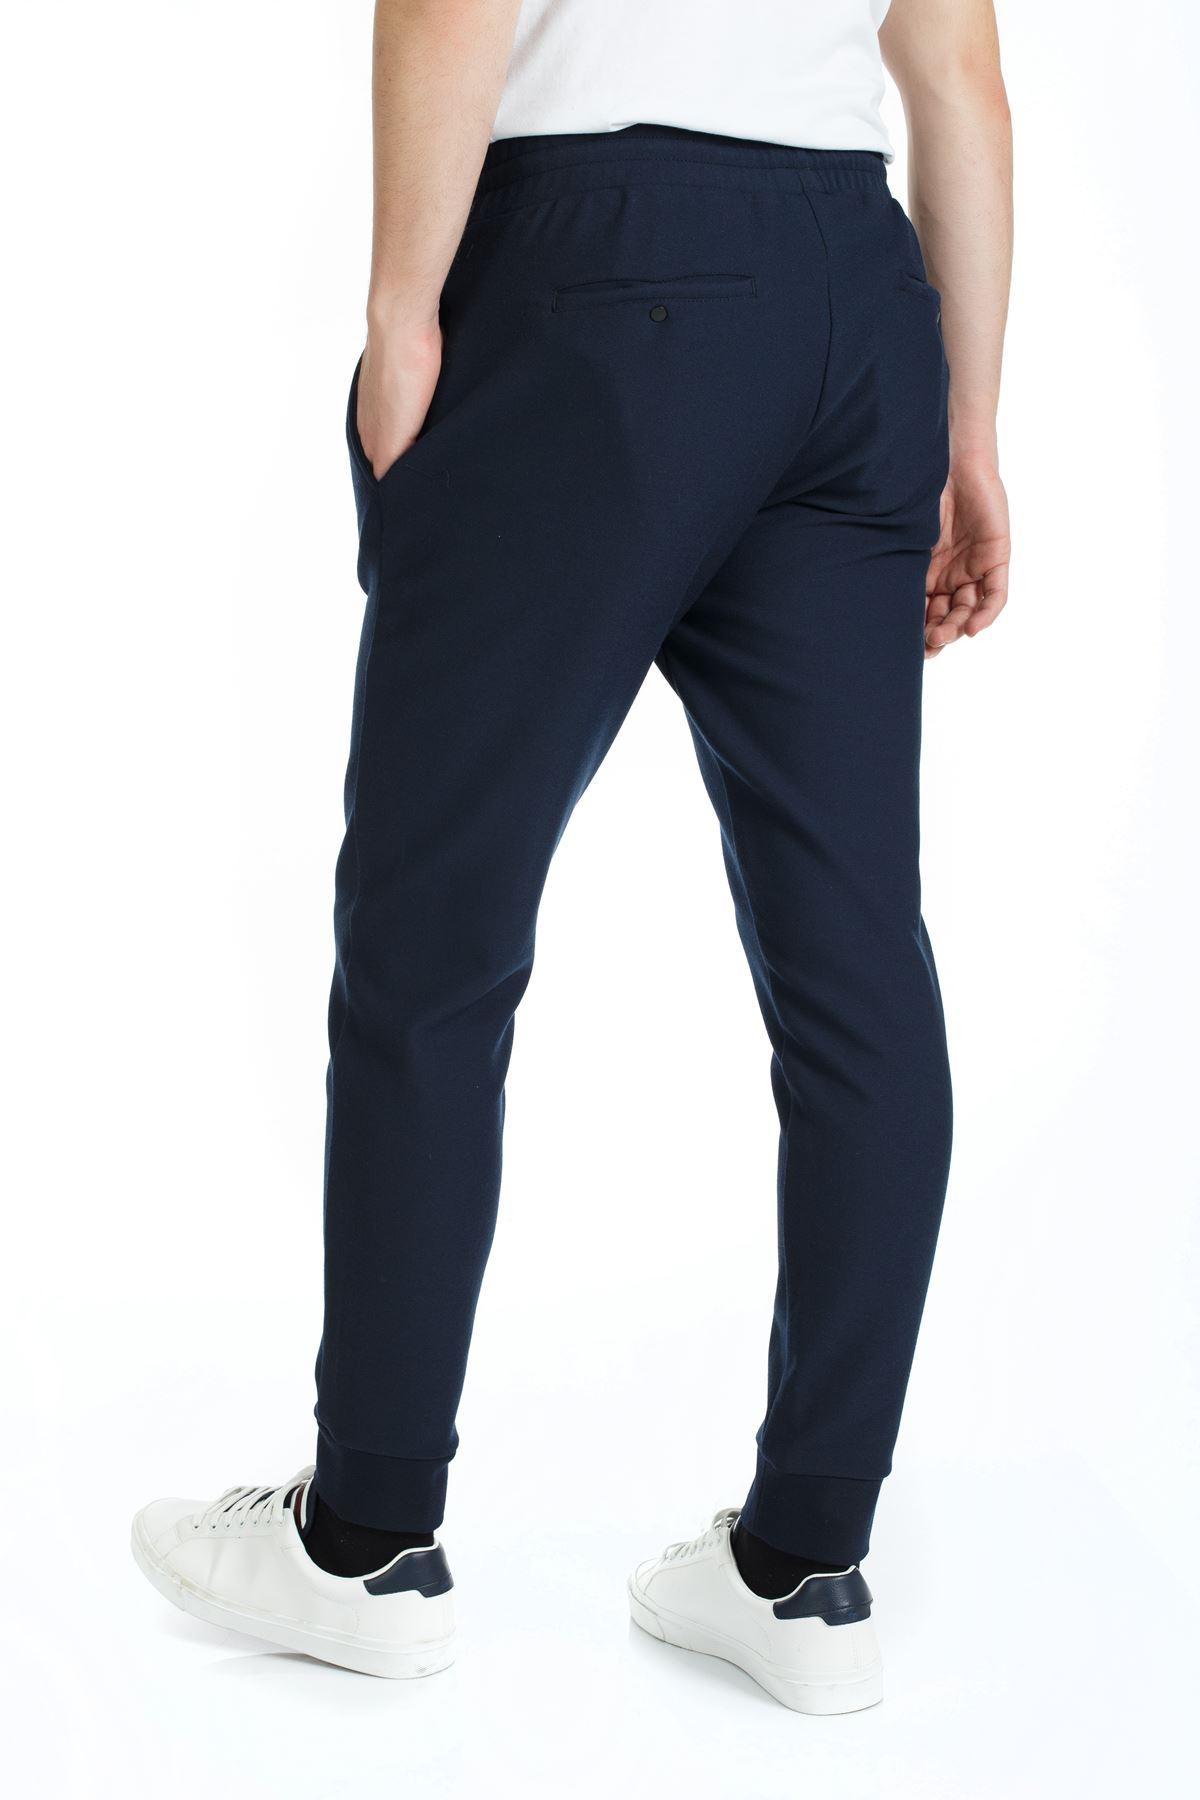 Lacivert Paça Lastikli İpli Slim Kalıp Jogger Pantolon